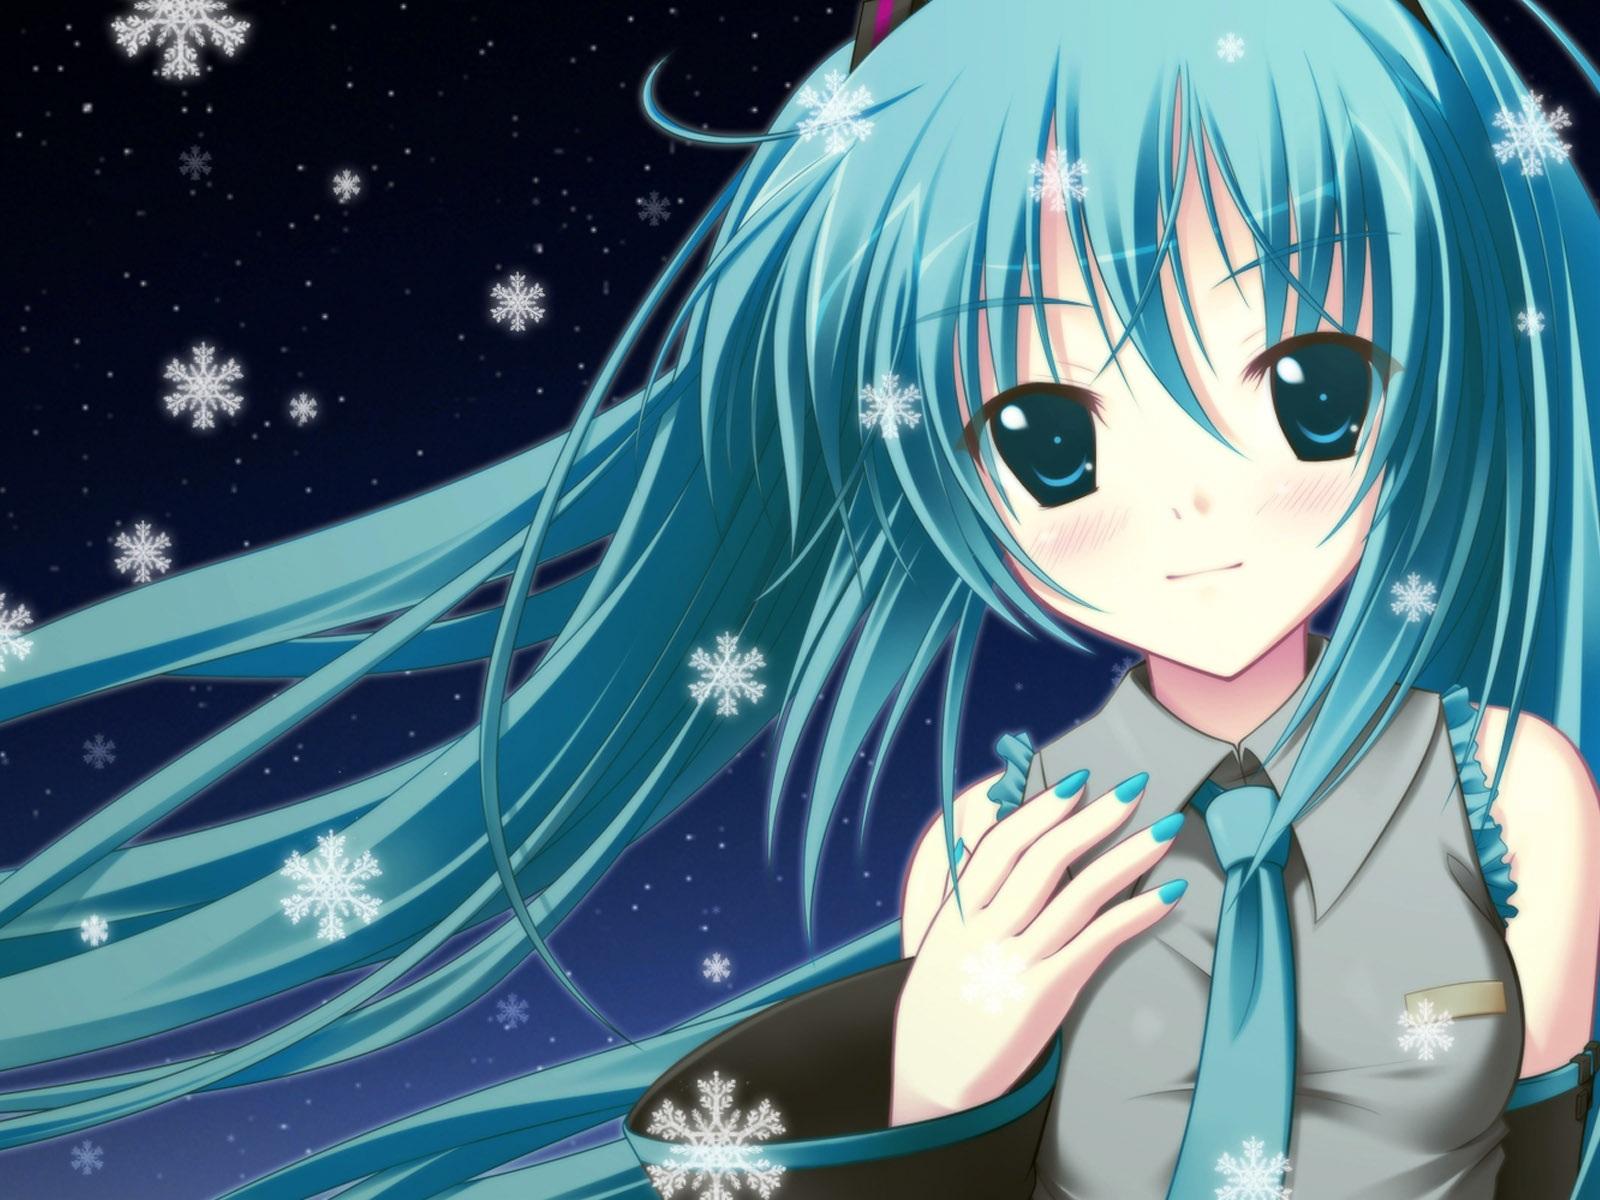 Blue hair anime girl wallpaper 1600x1200 resolution - Anime 1600x1200 ...